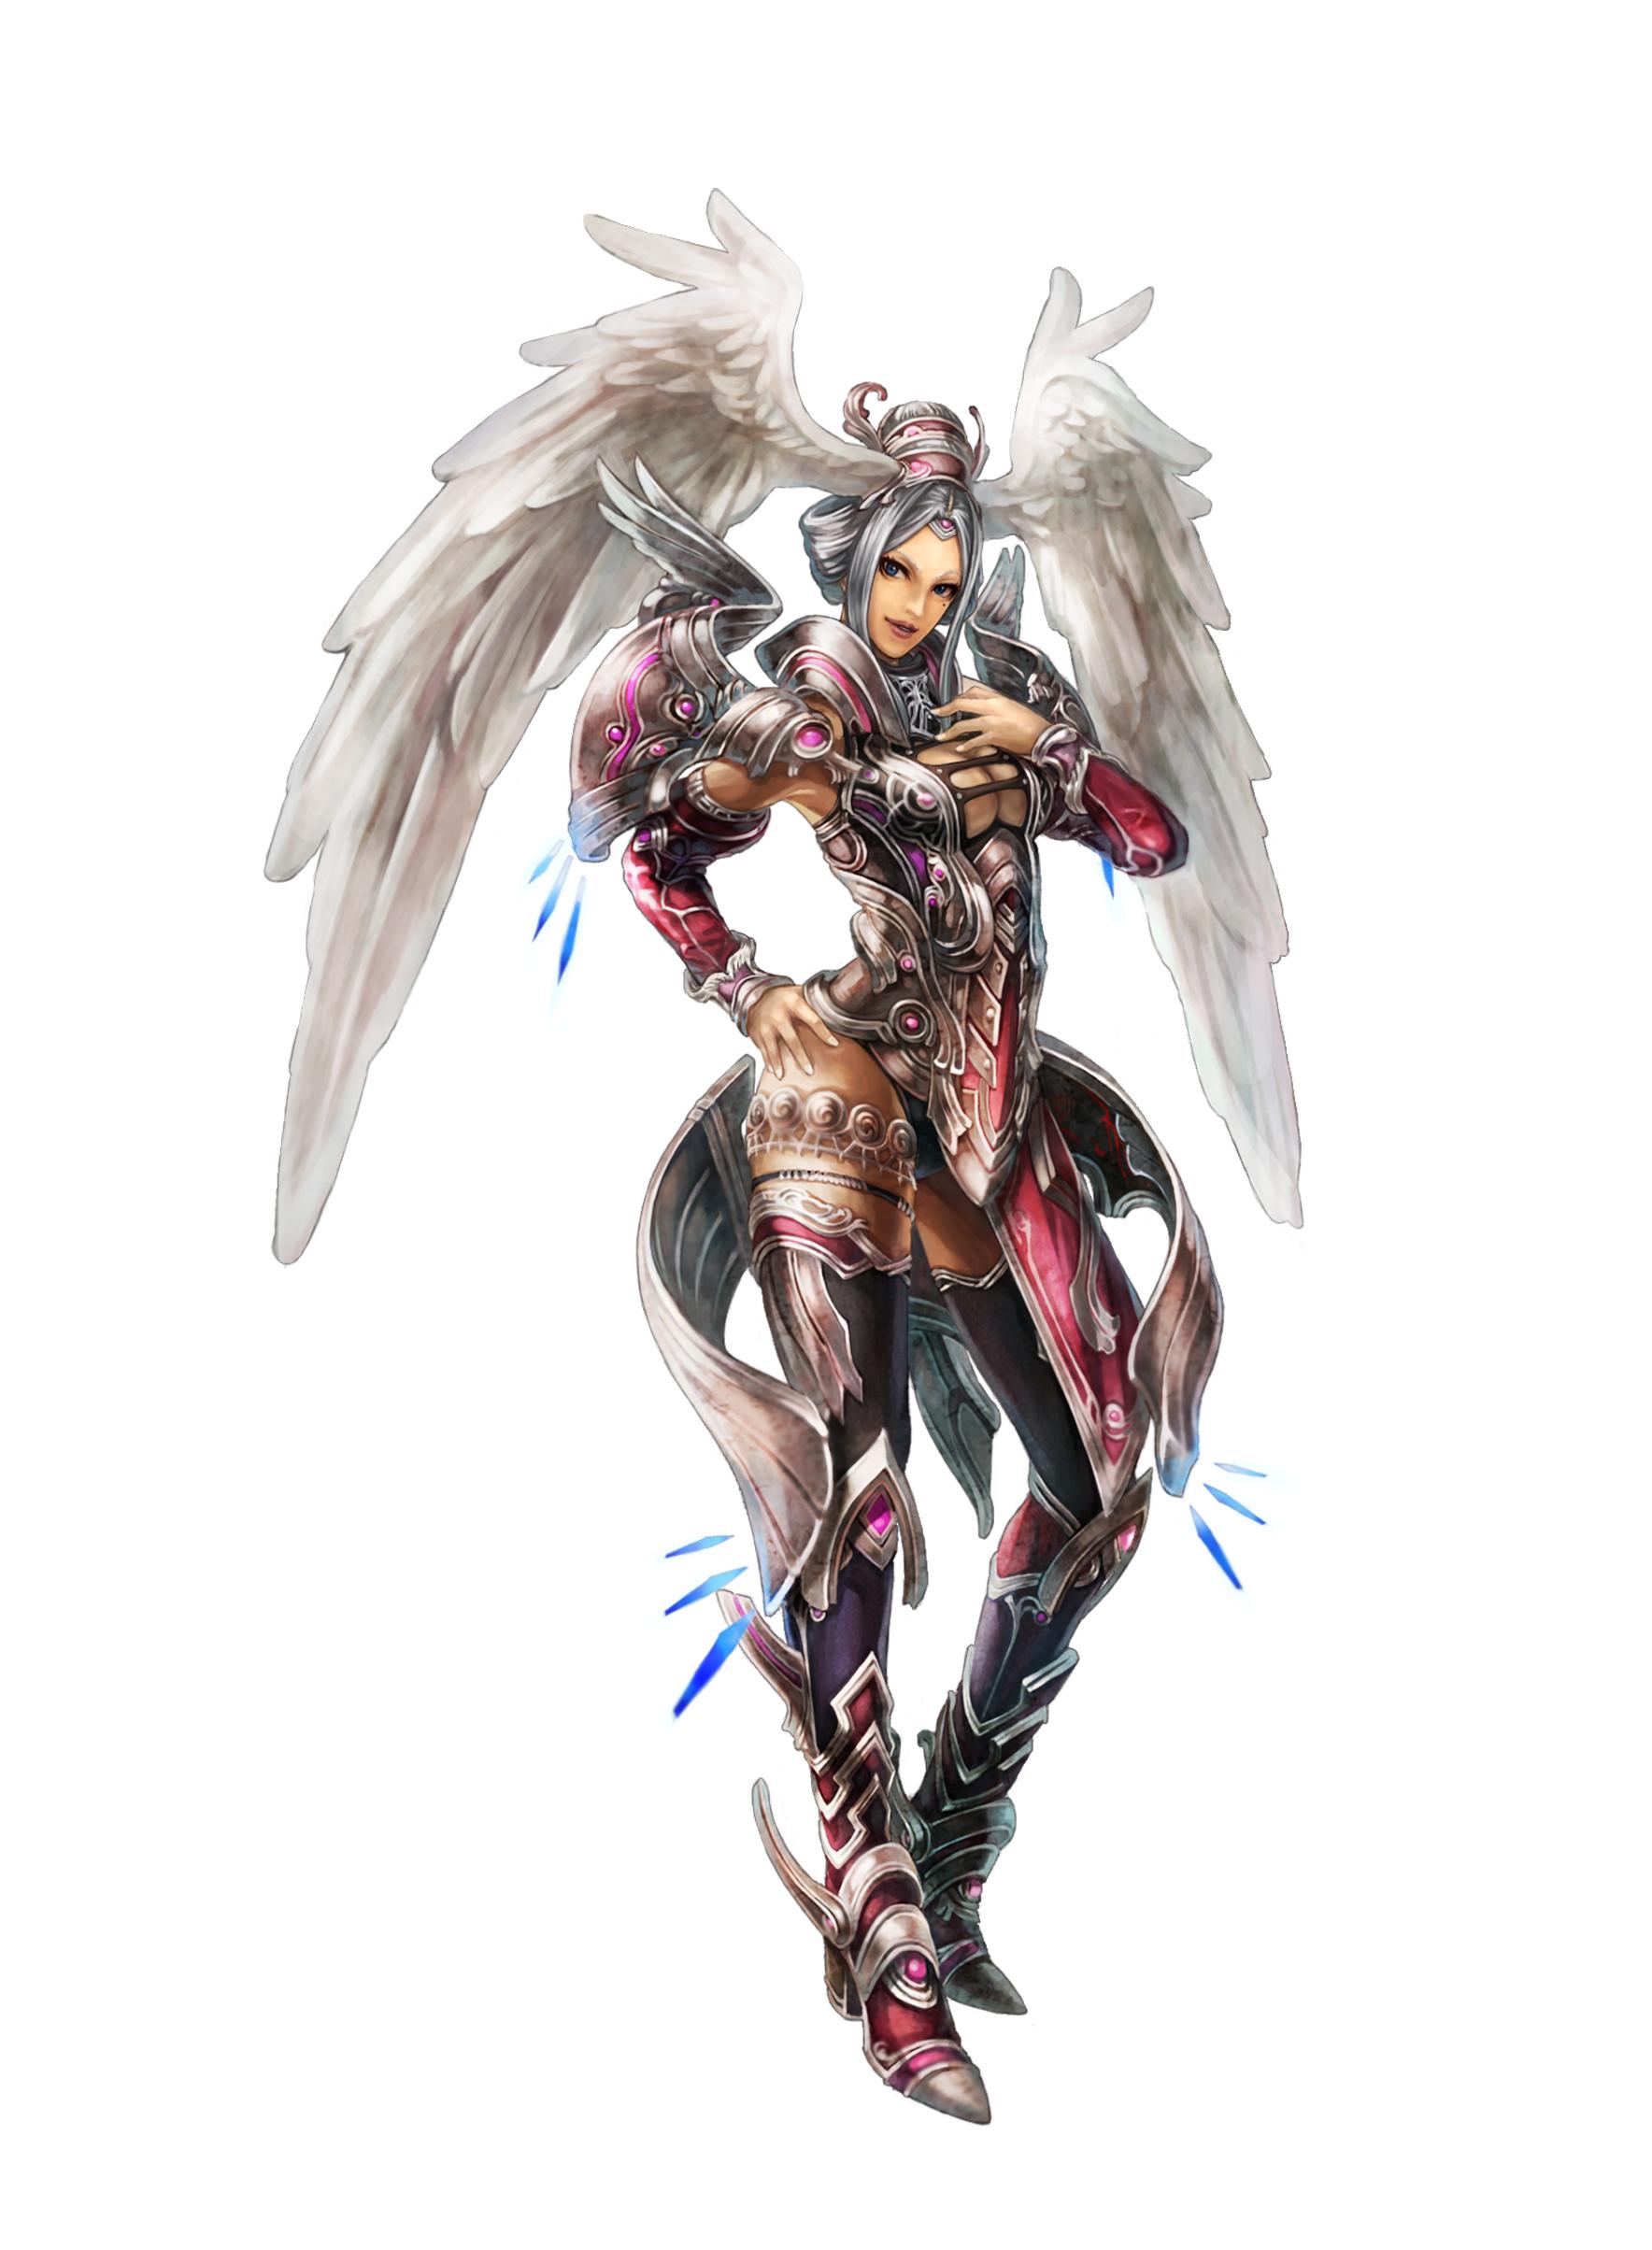 Xenoblade characters